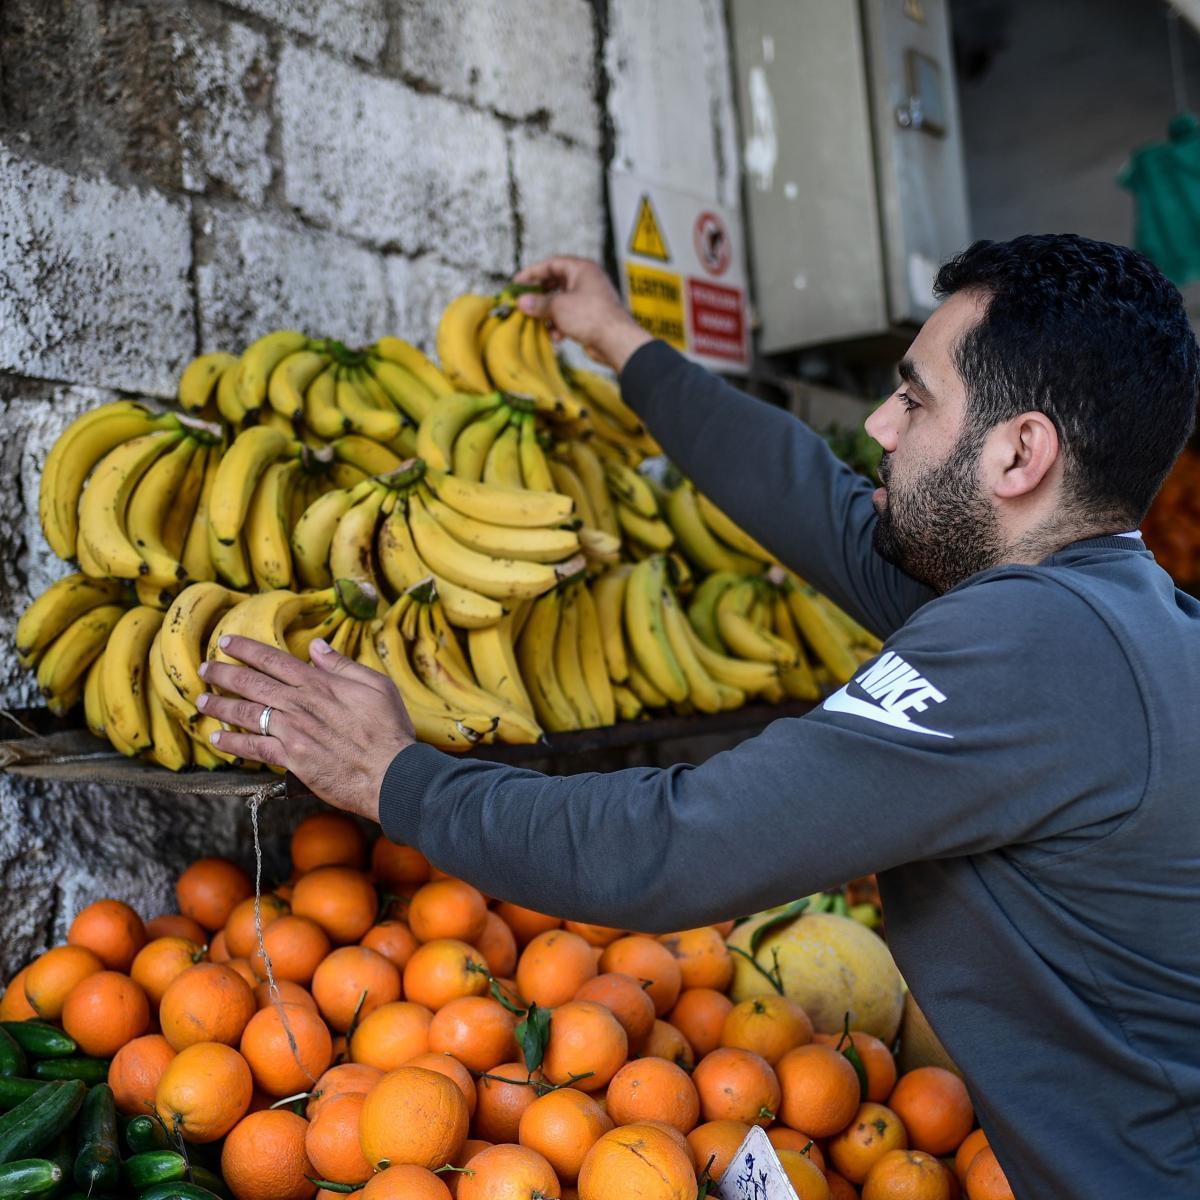 لاجئ سوري في تركيا (أوزان كوزيه/ فرانس برس)